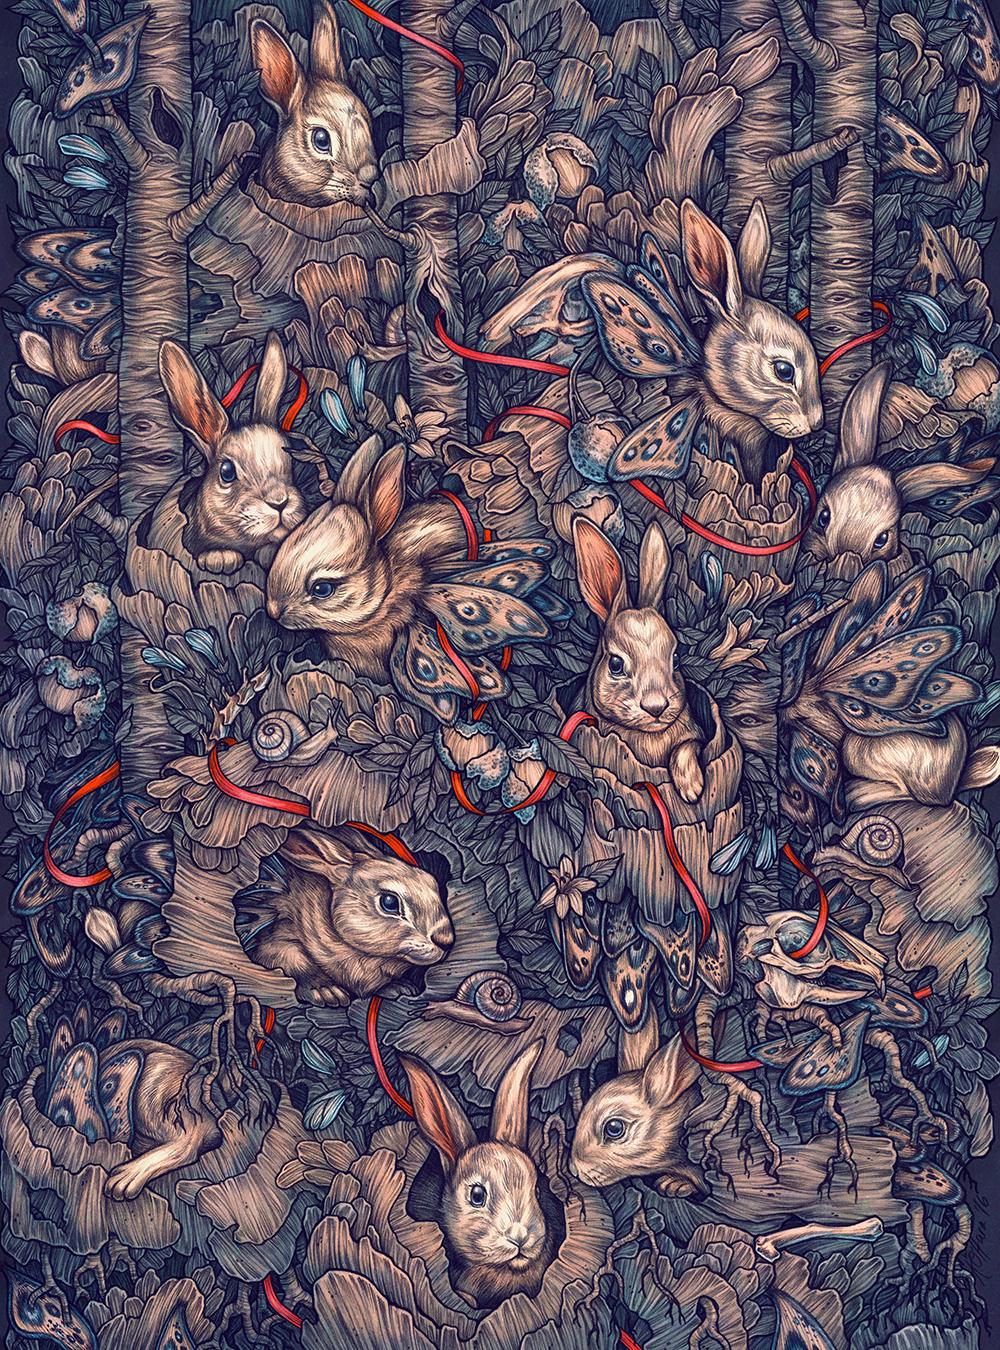 """Bunnerflies"" by Kate O'Hara"